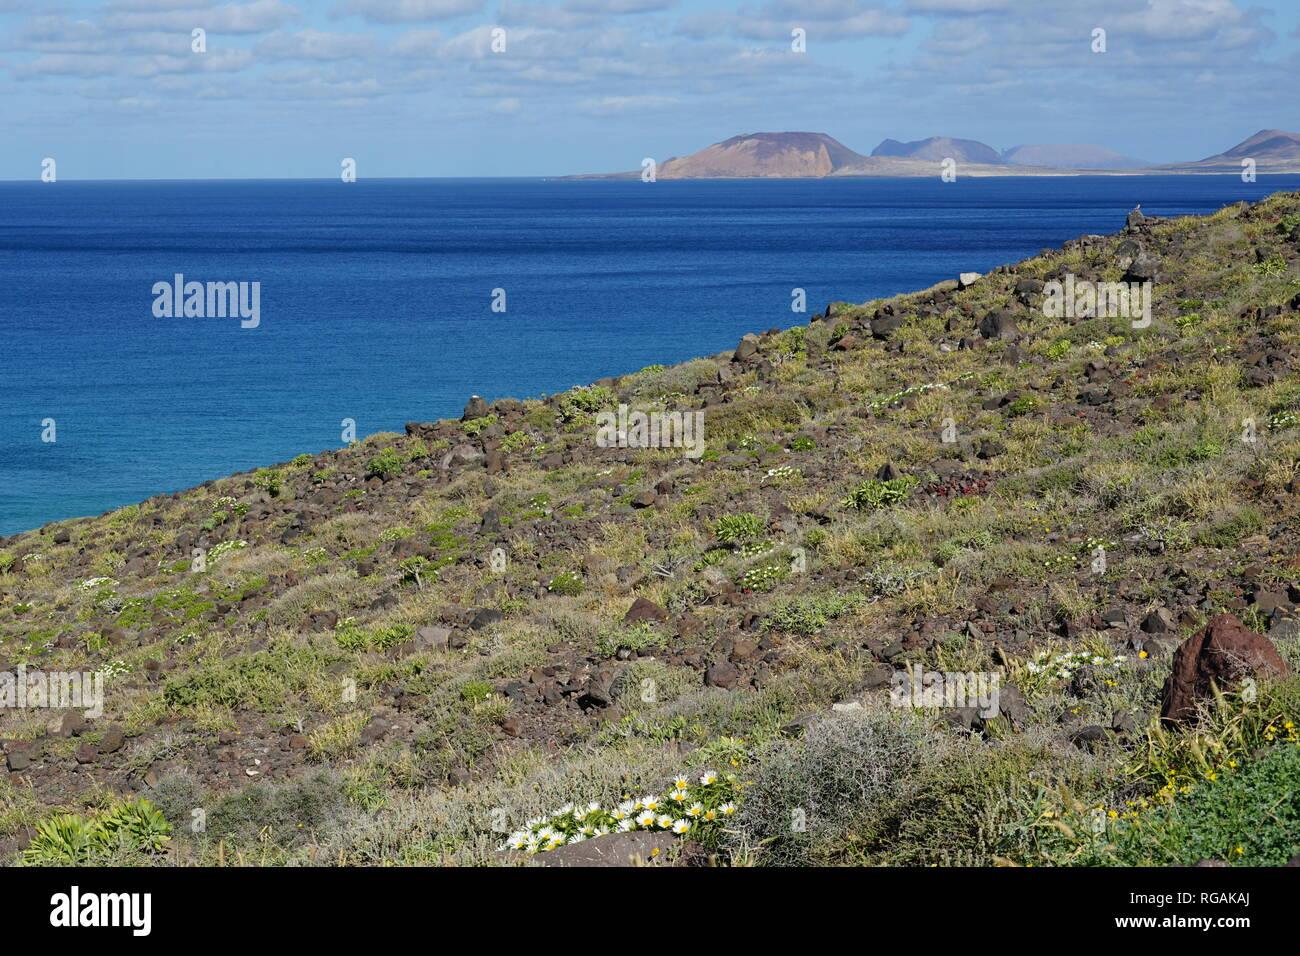 Riscos de Famara, mit Blick nach La Graciosa, Lanzarote, Kanarische Inseln, Spanien Stockbild